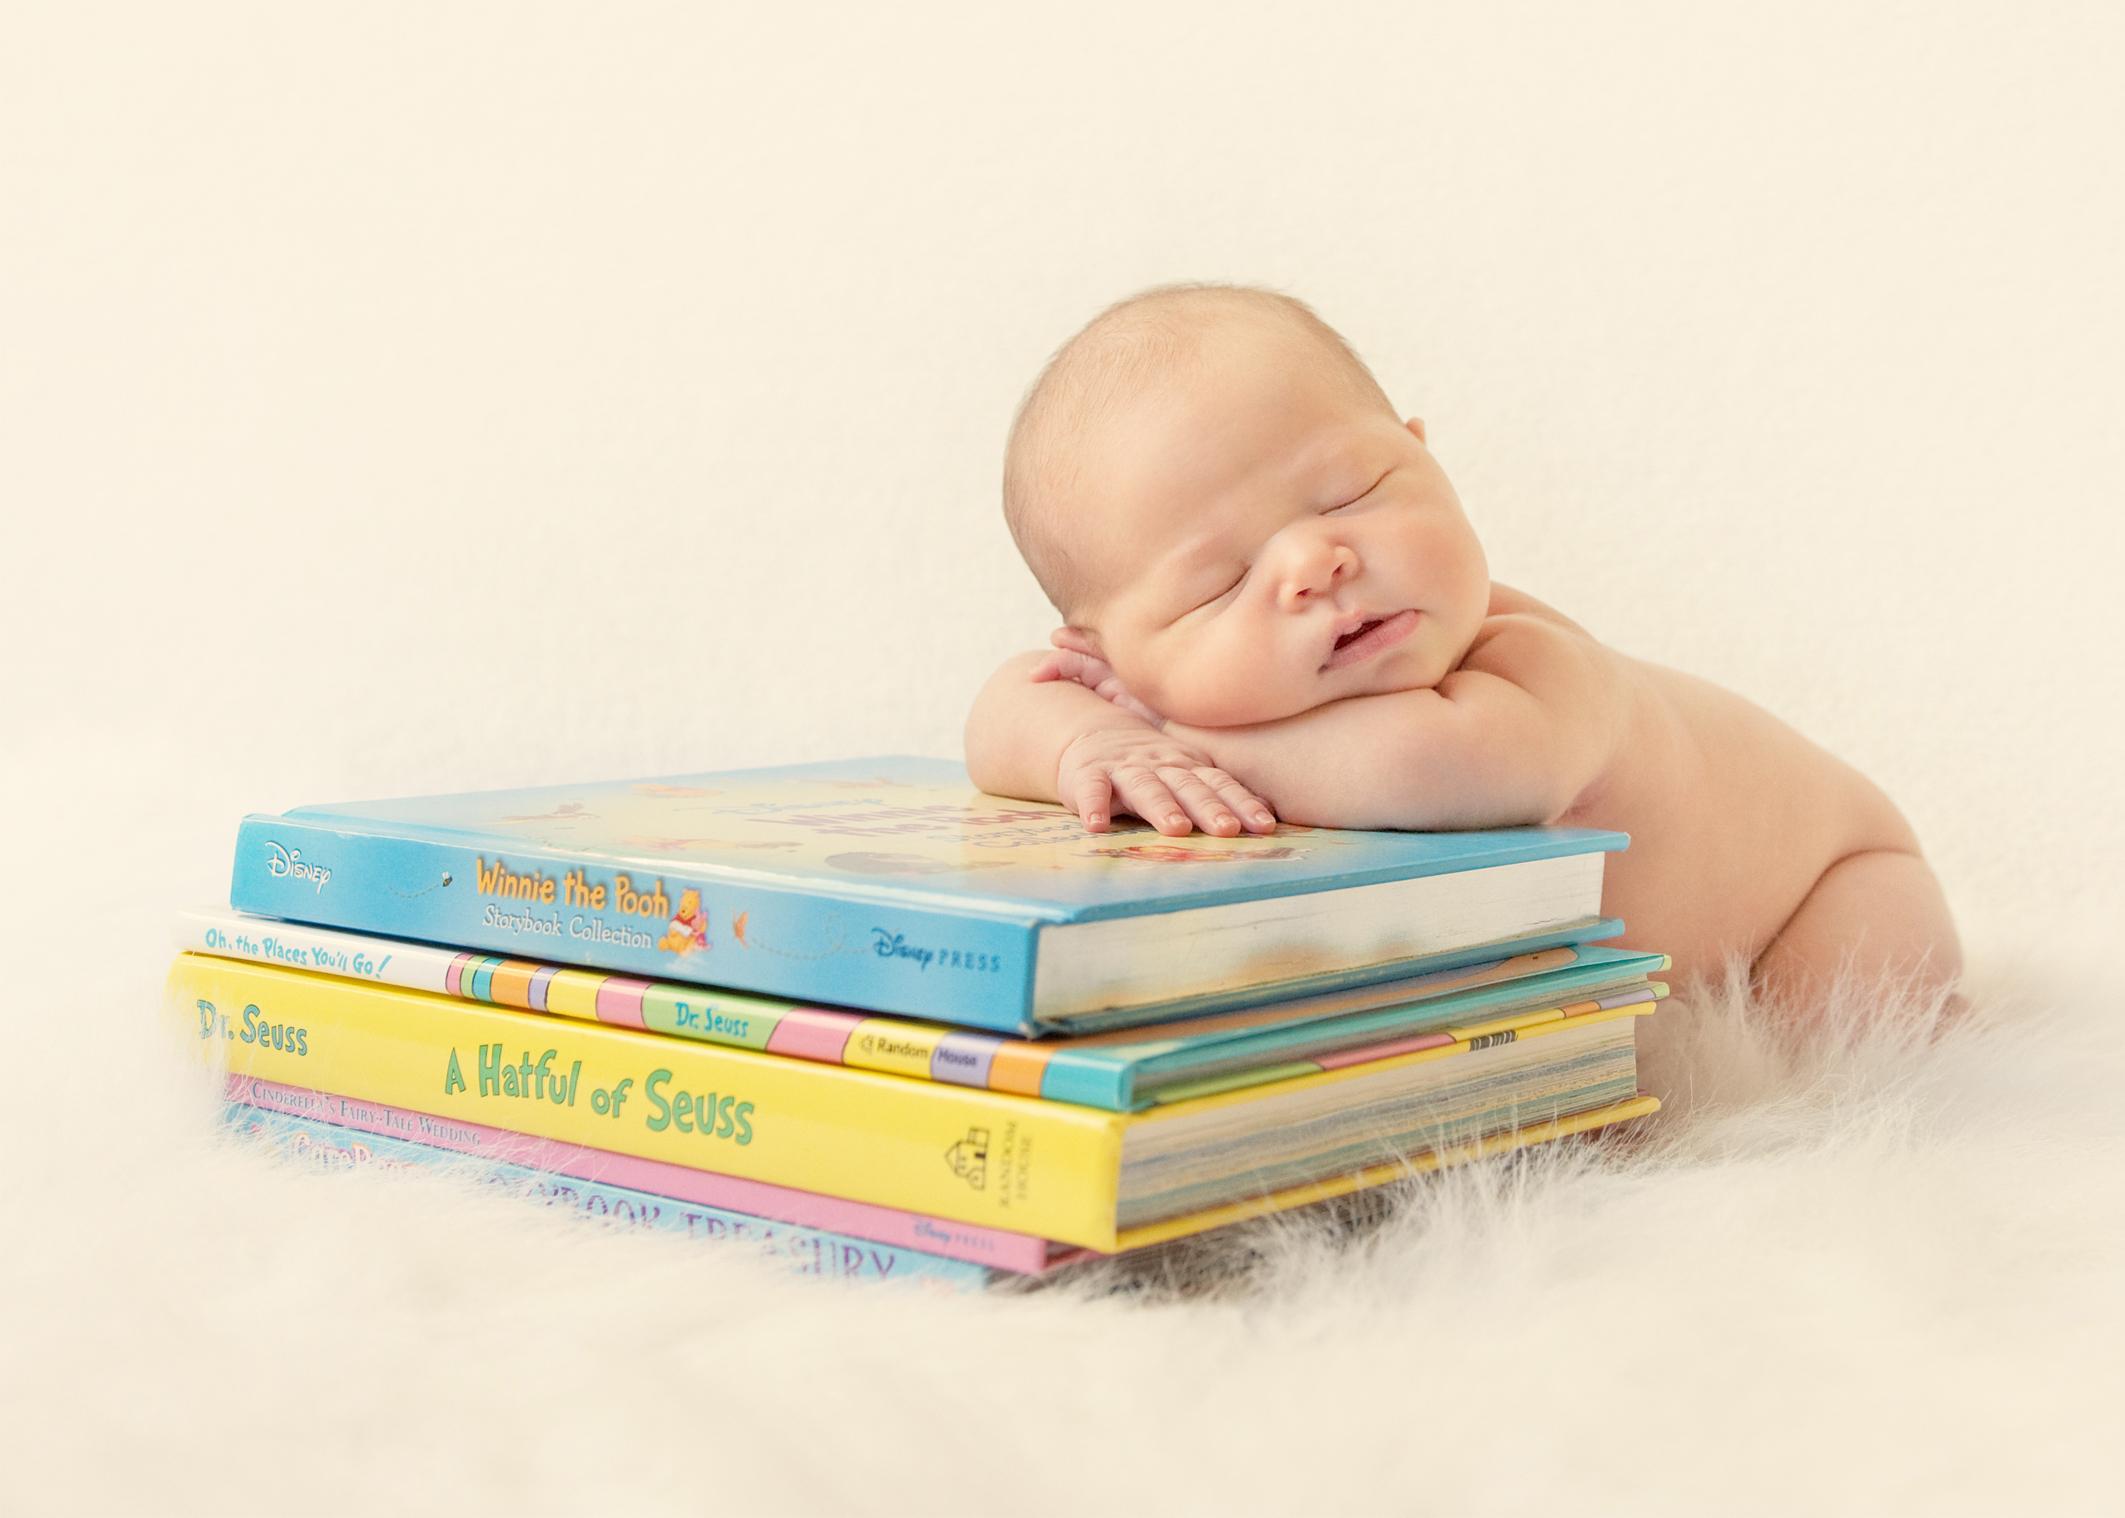 Baby - Fell Asleep Reading 8x10